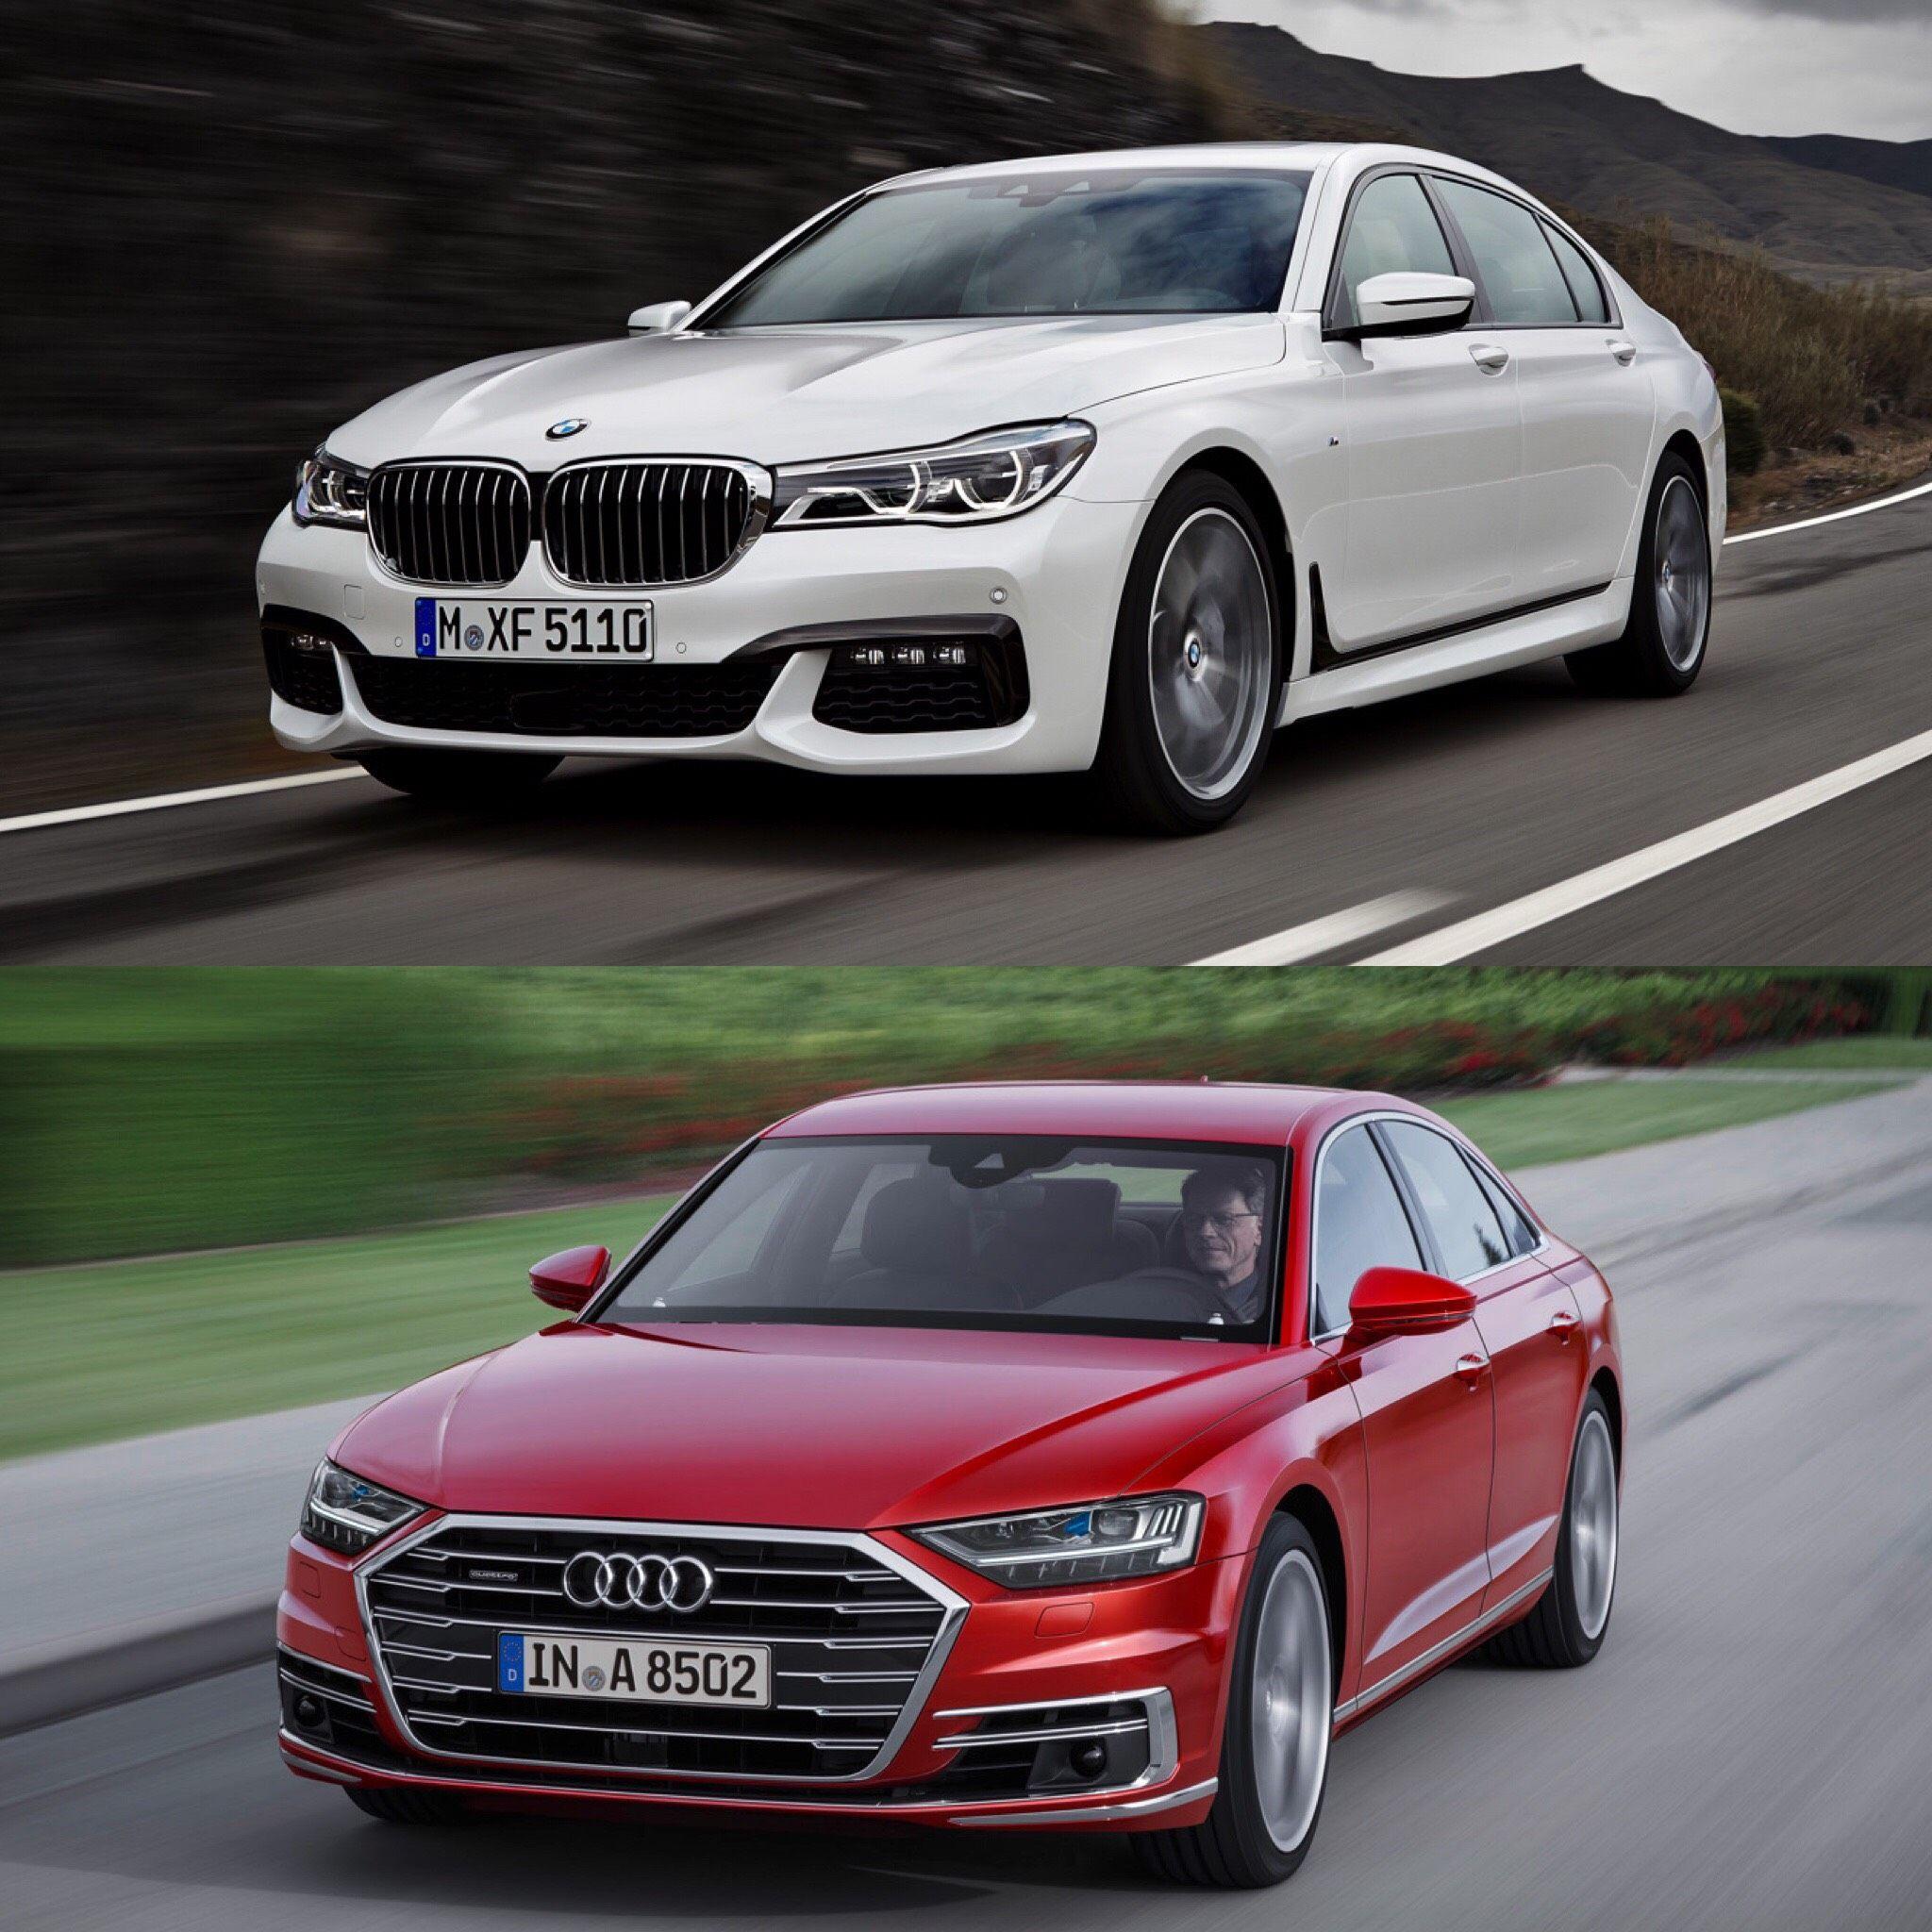 Photo Comparison 2018 Audi A7 Vs Bmw 6 Series Gran Turismo: Audi A8, Audi, Bmw 7 Series